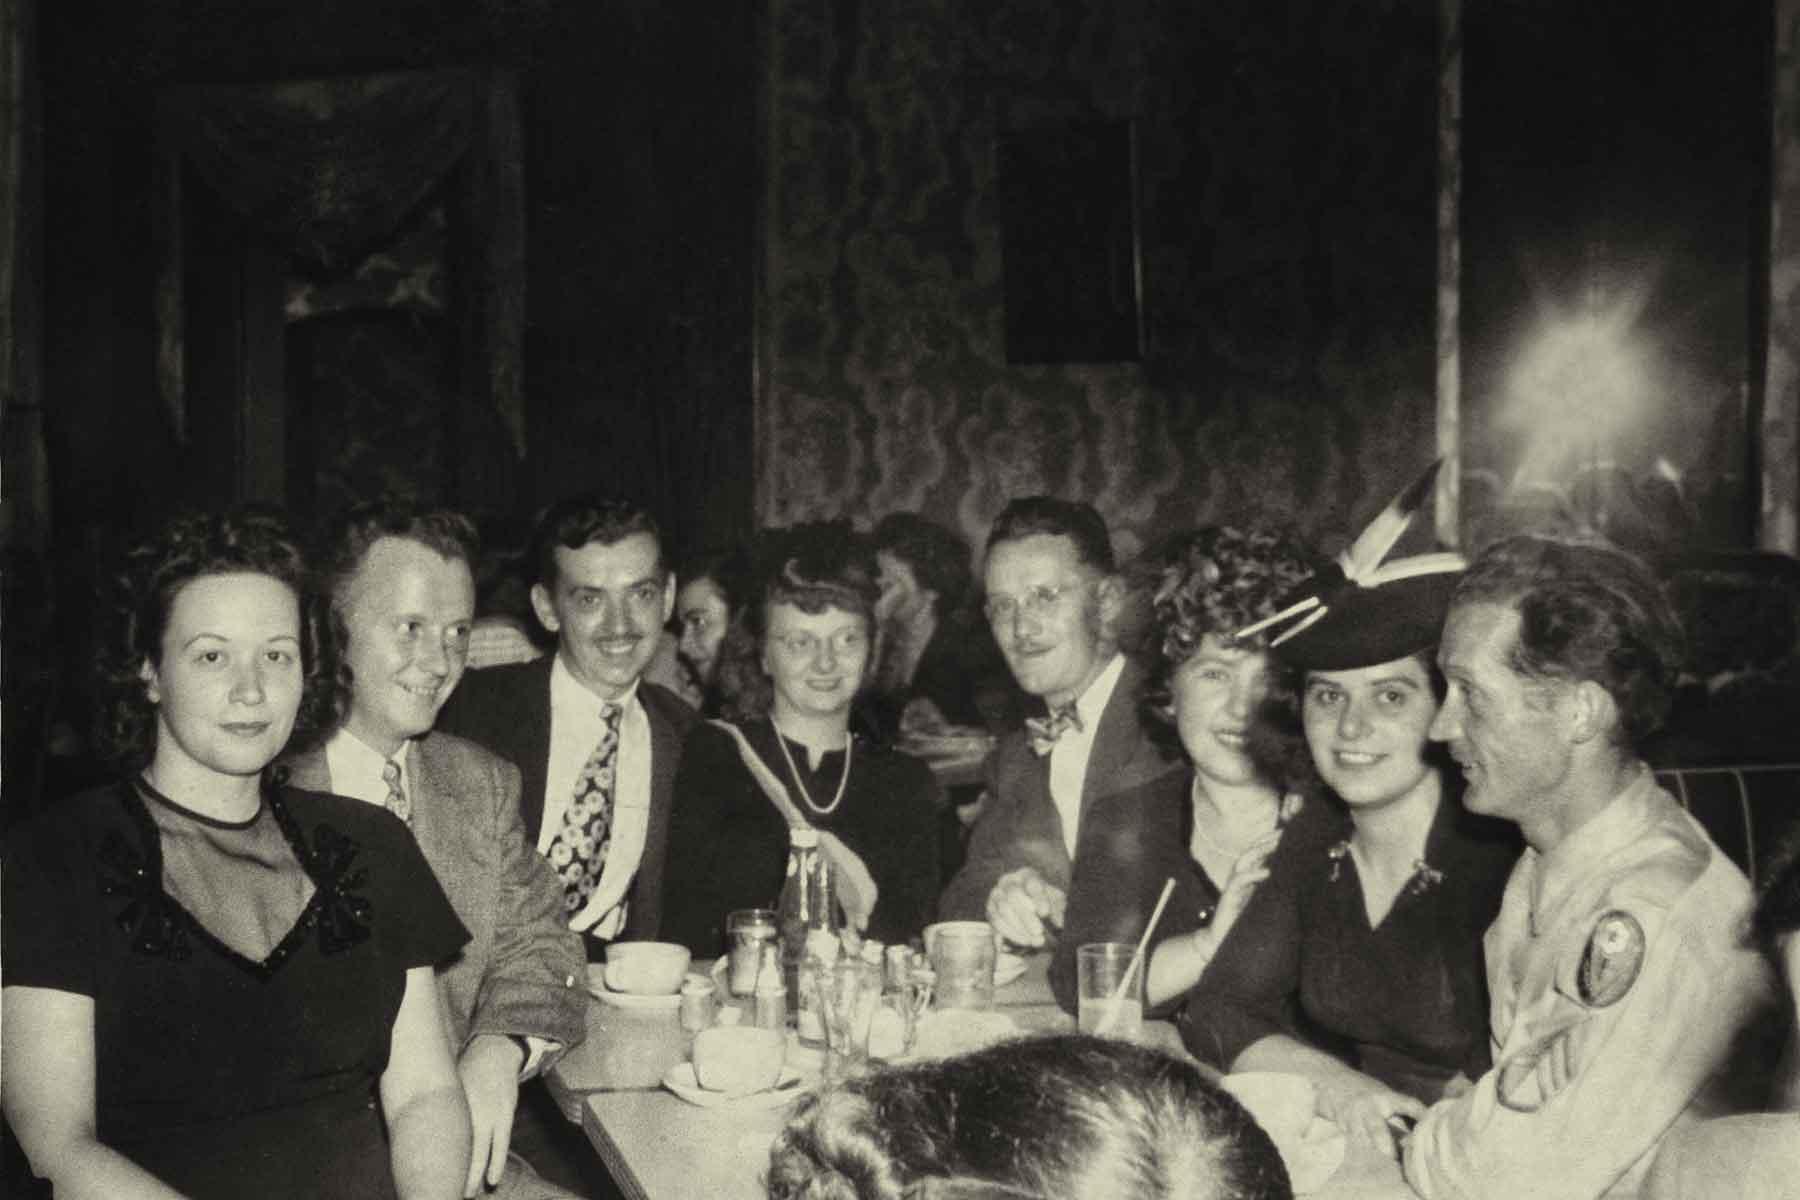 Jack Dempsey's Bar circa 1945